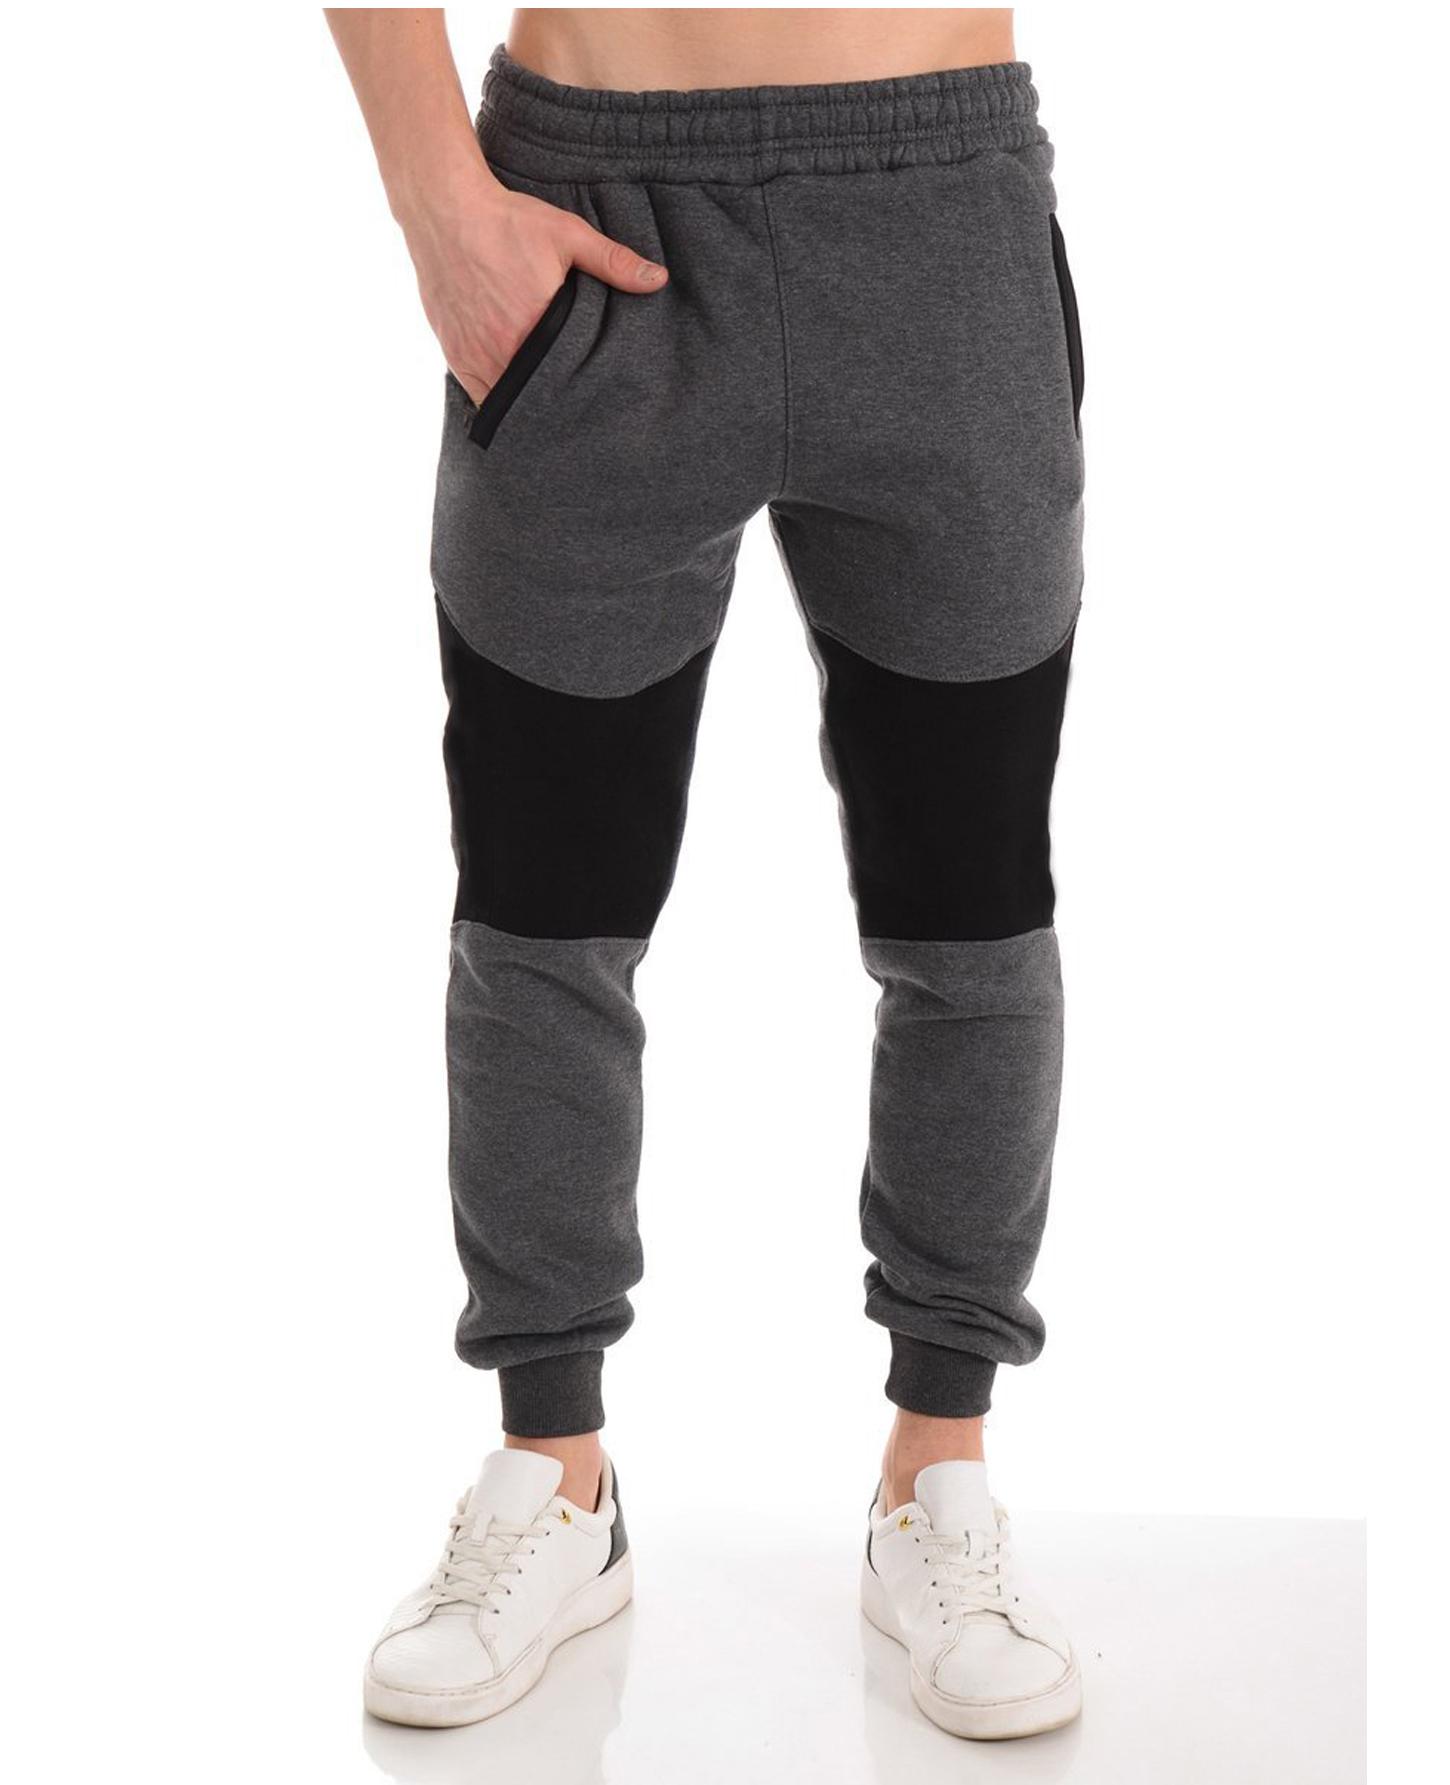 Men's Casual Zipper Stitching Trousers Autumn Pants Sports Jogging Pants 2020 New Men's Pants Tight Long Cotton Pants Sports Pants 1